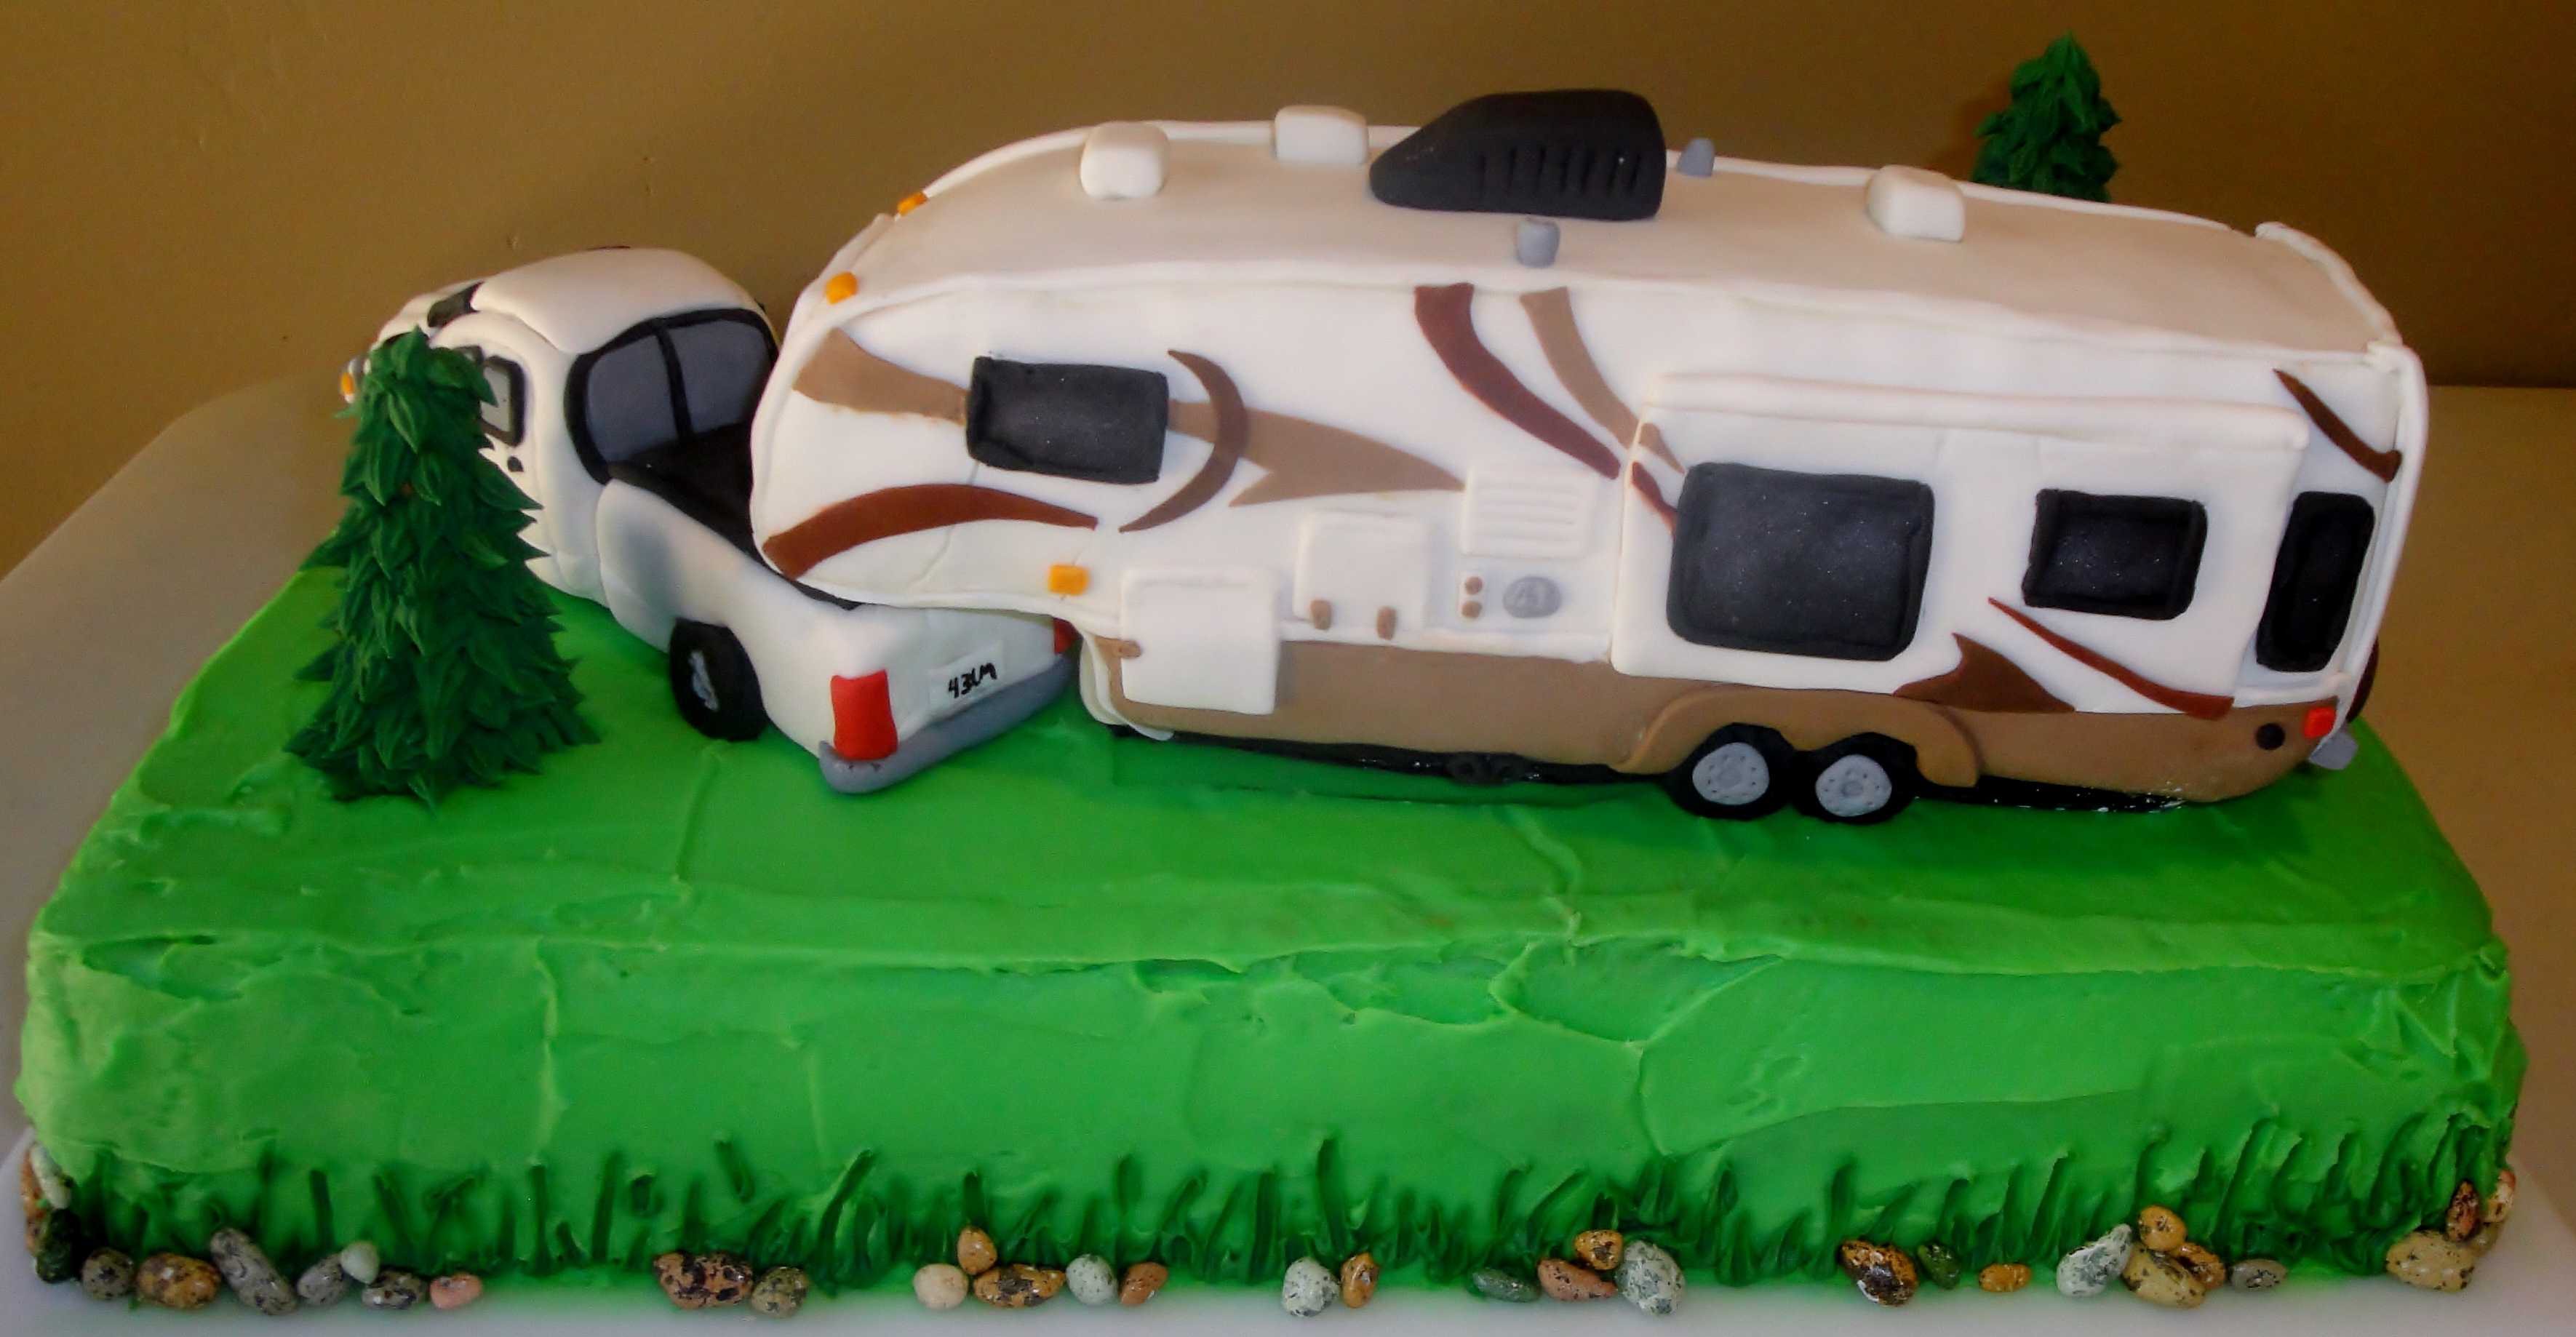 Wheel Cake Decorating